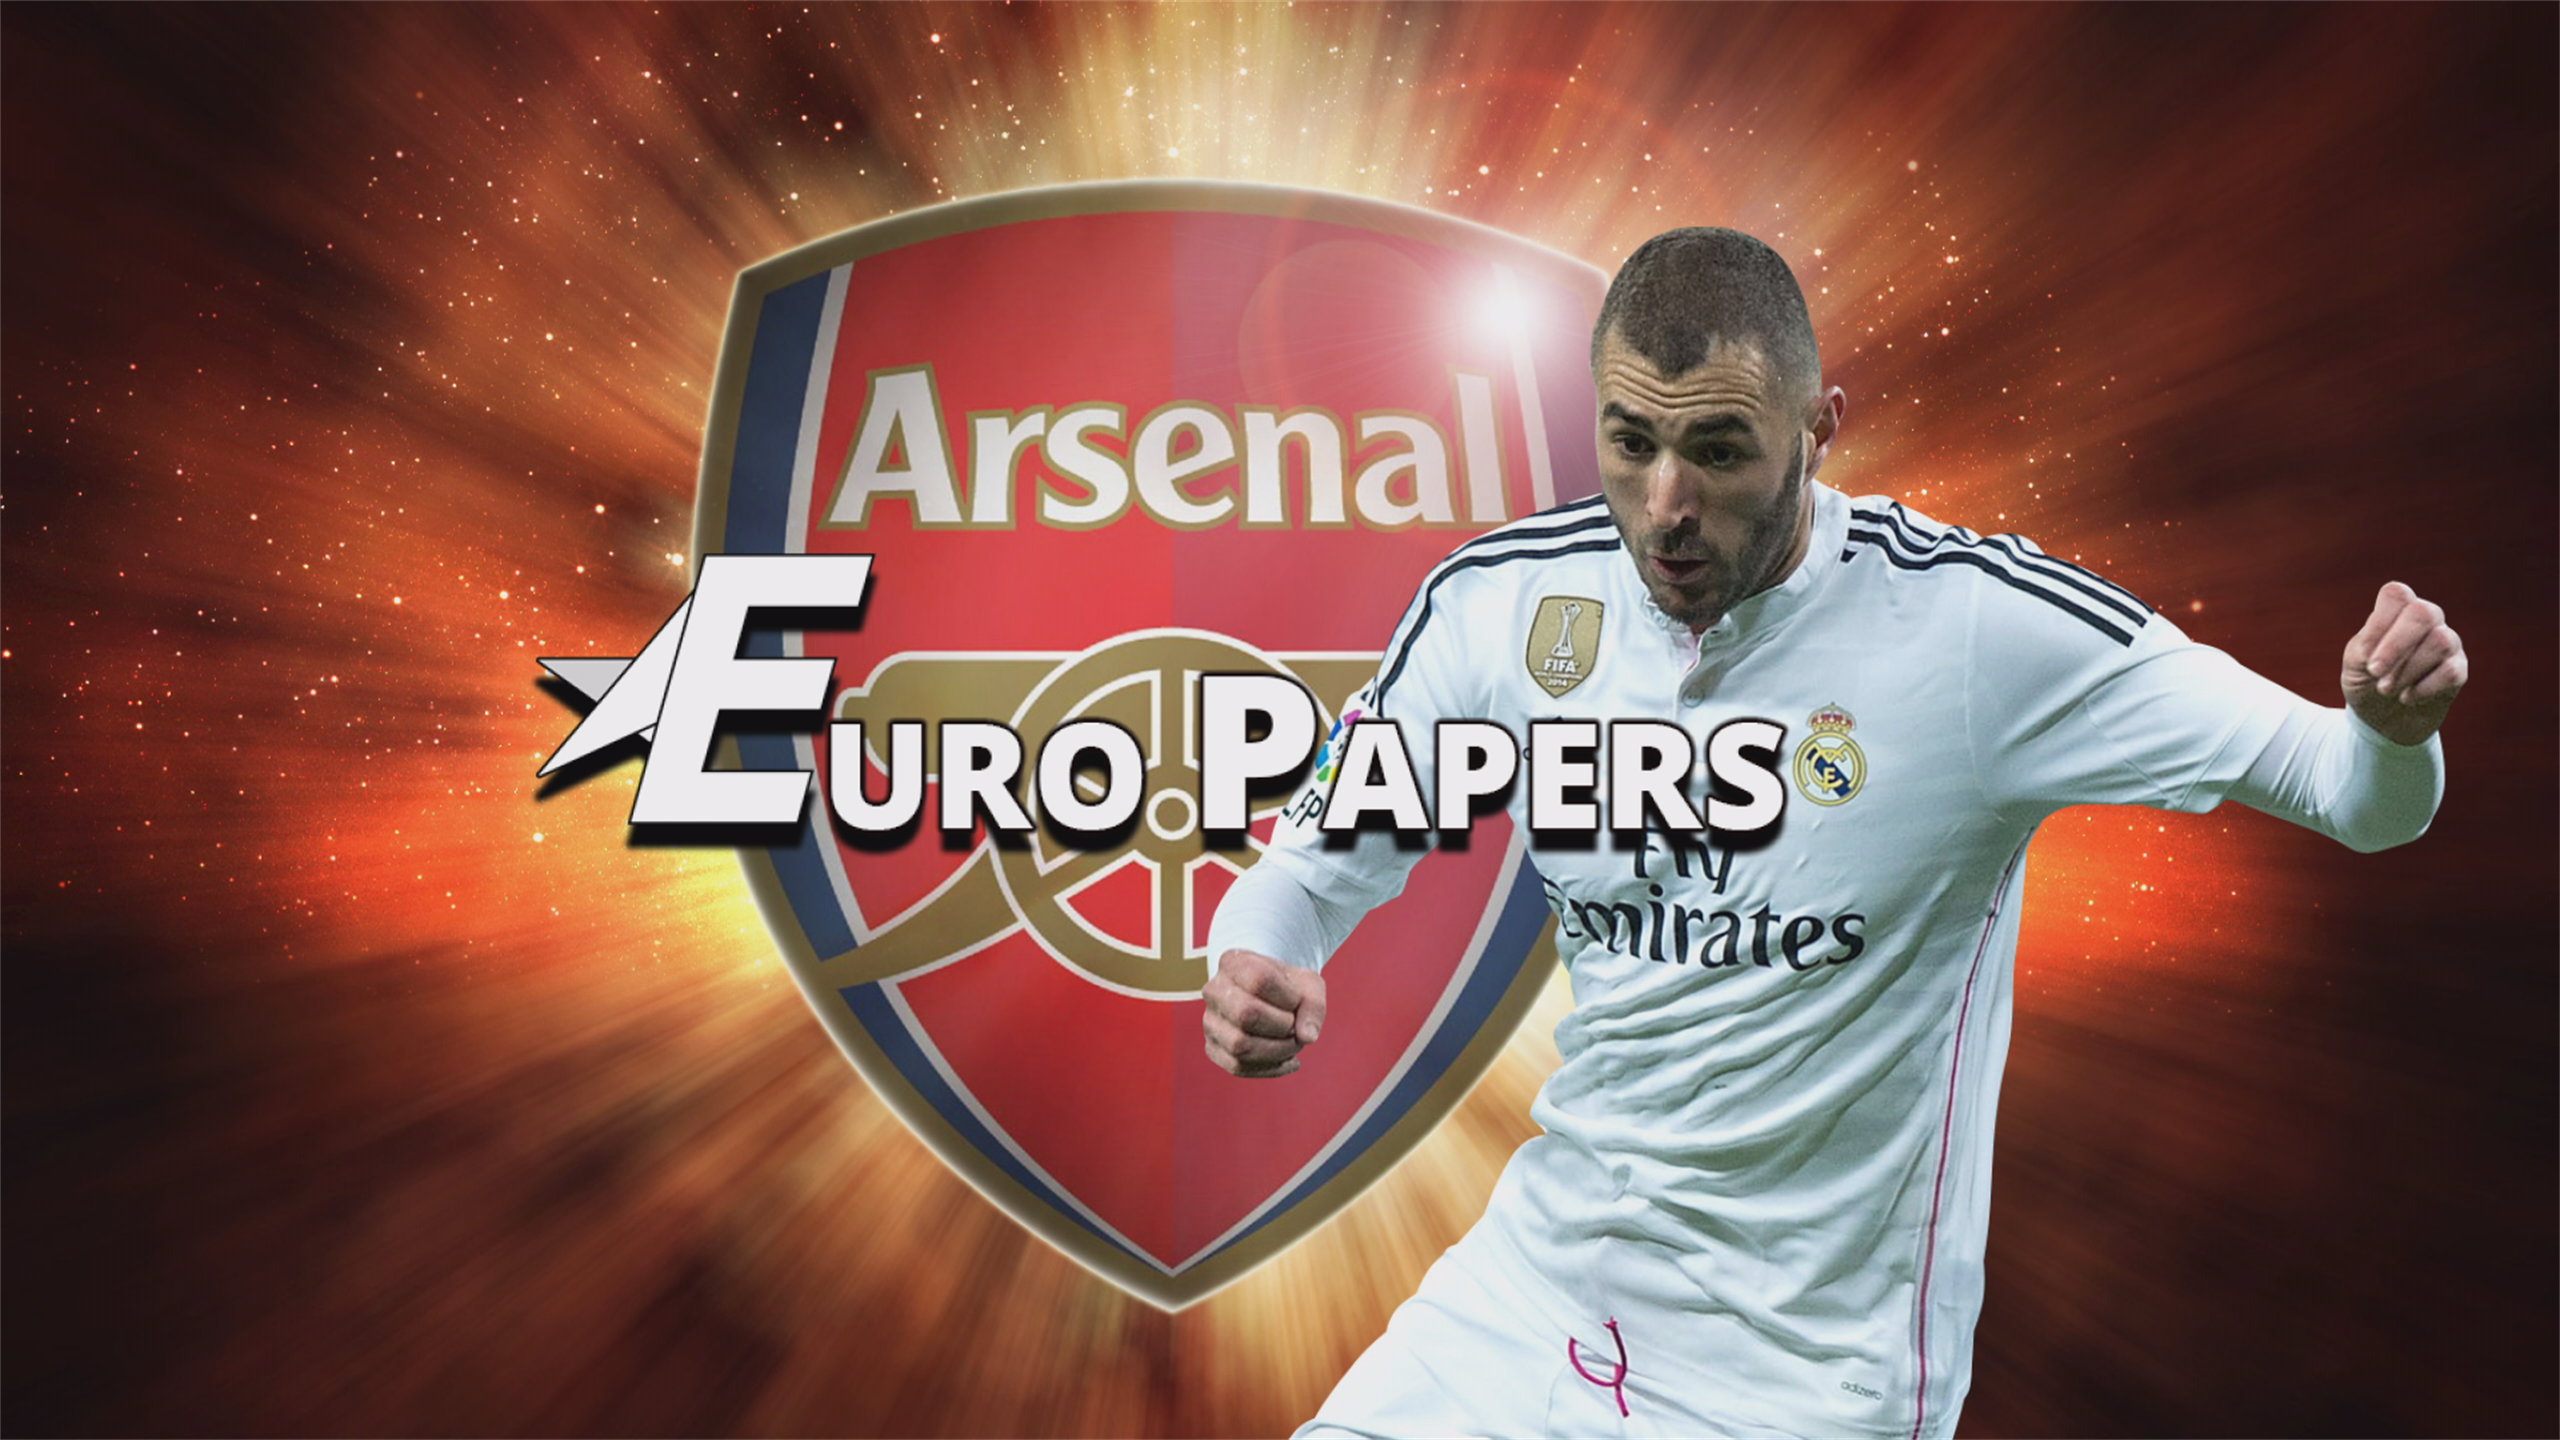 Euro Papers: Karim Benzema to Arsenal?